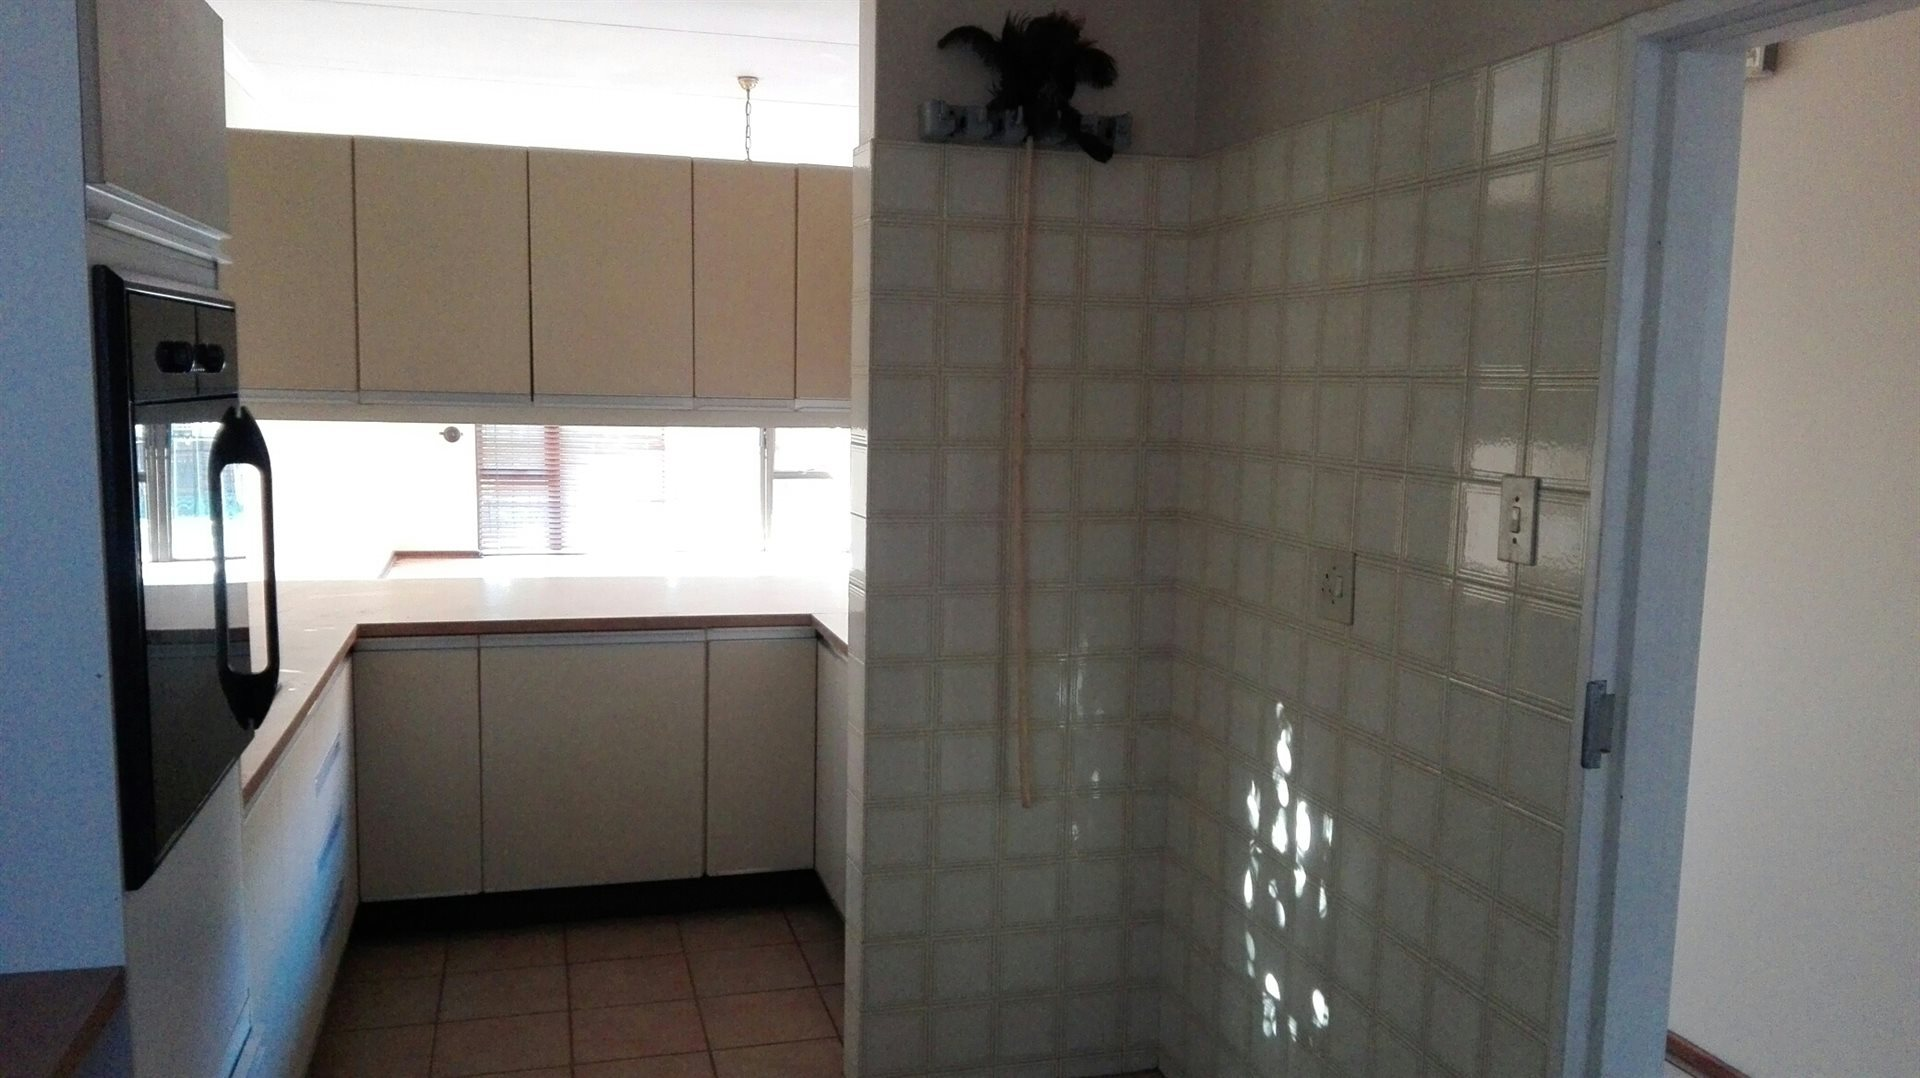 Zwartkop property for sale. Ref No: 13521136. Picture no 2